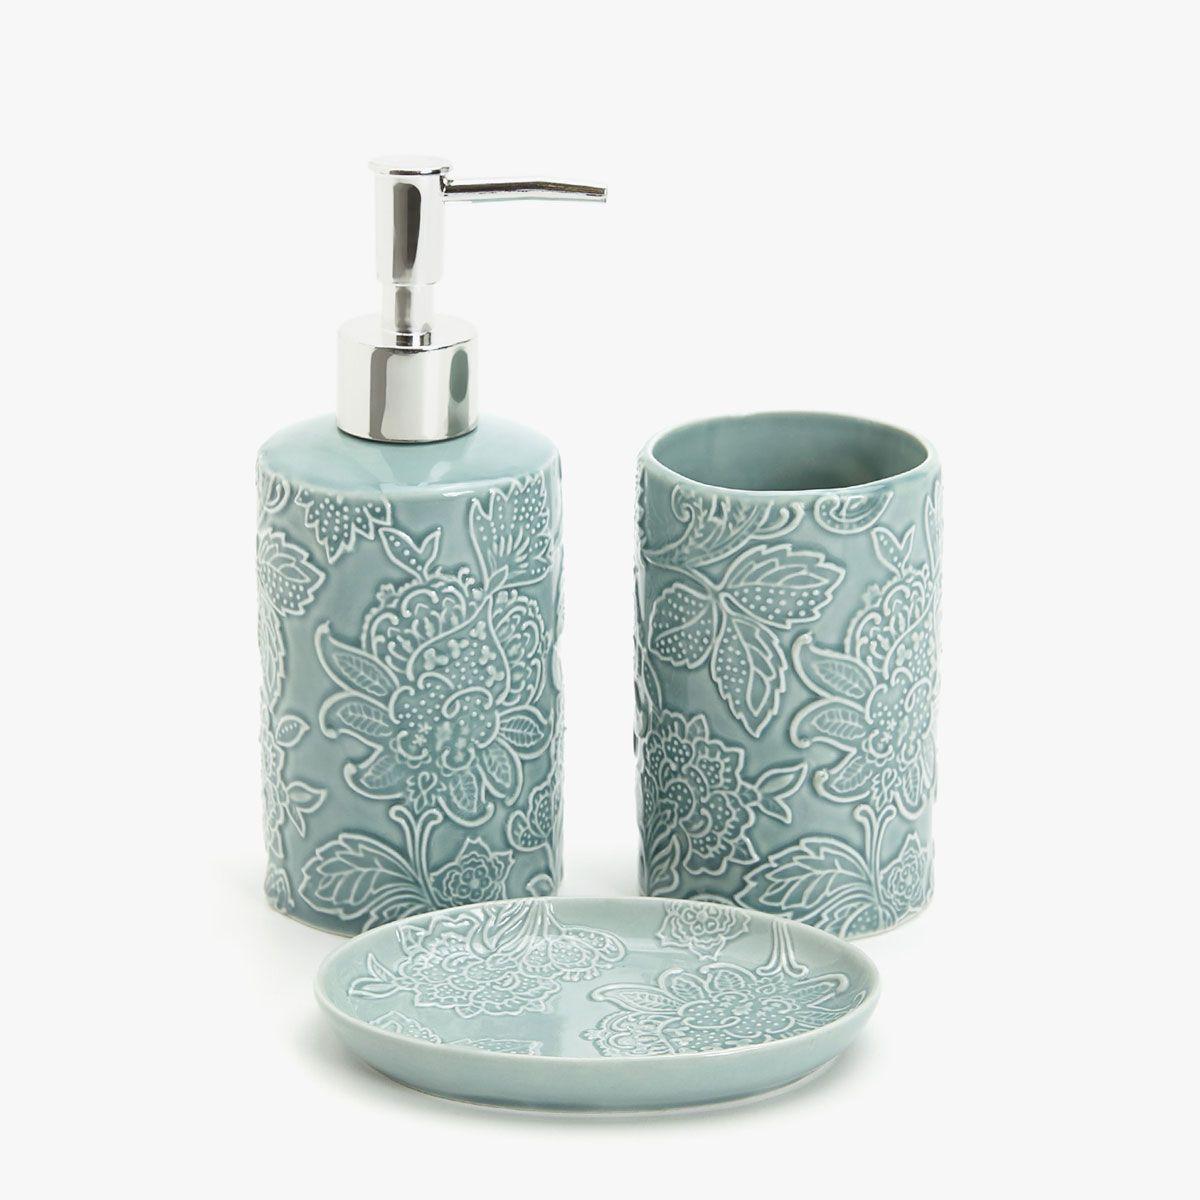 Blue floral bathroom set   Bath accessories, Bathroom accessories ...